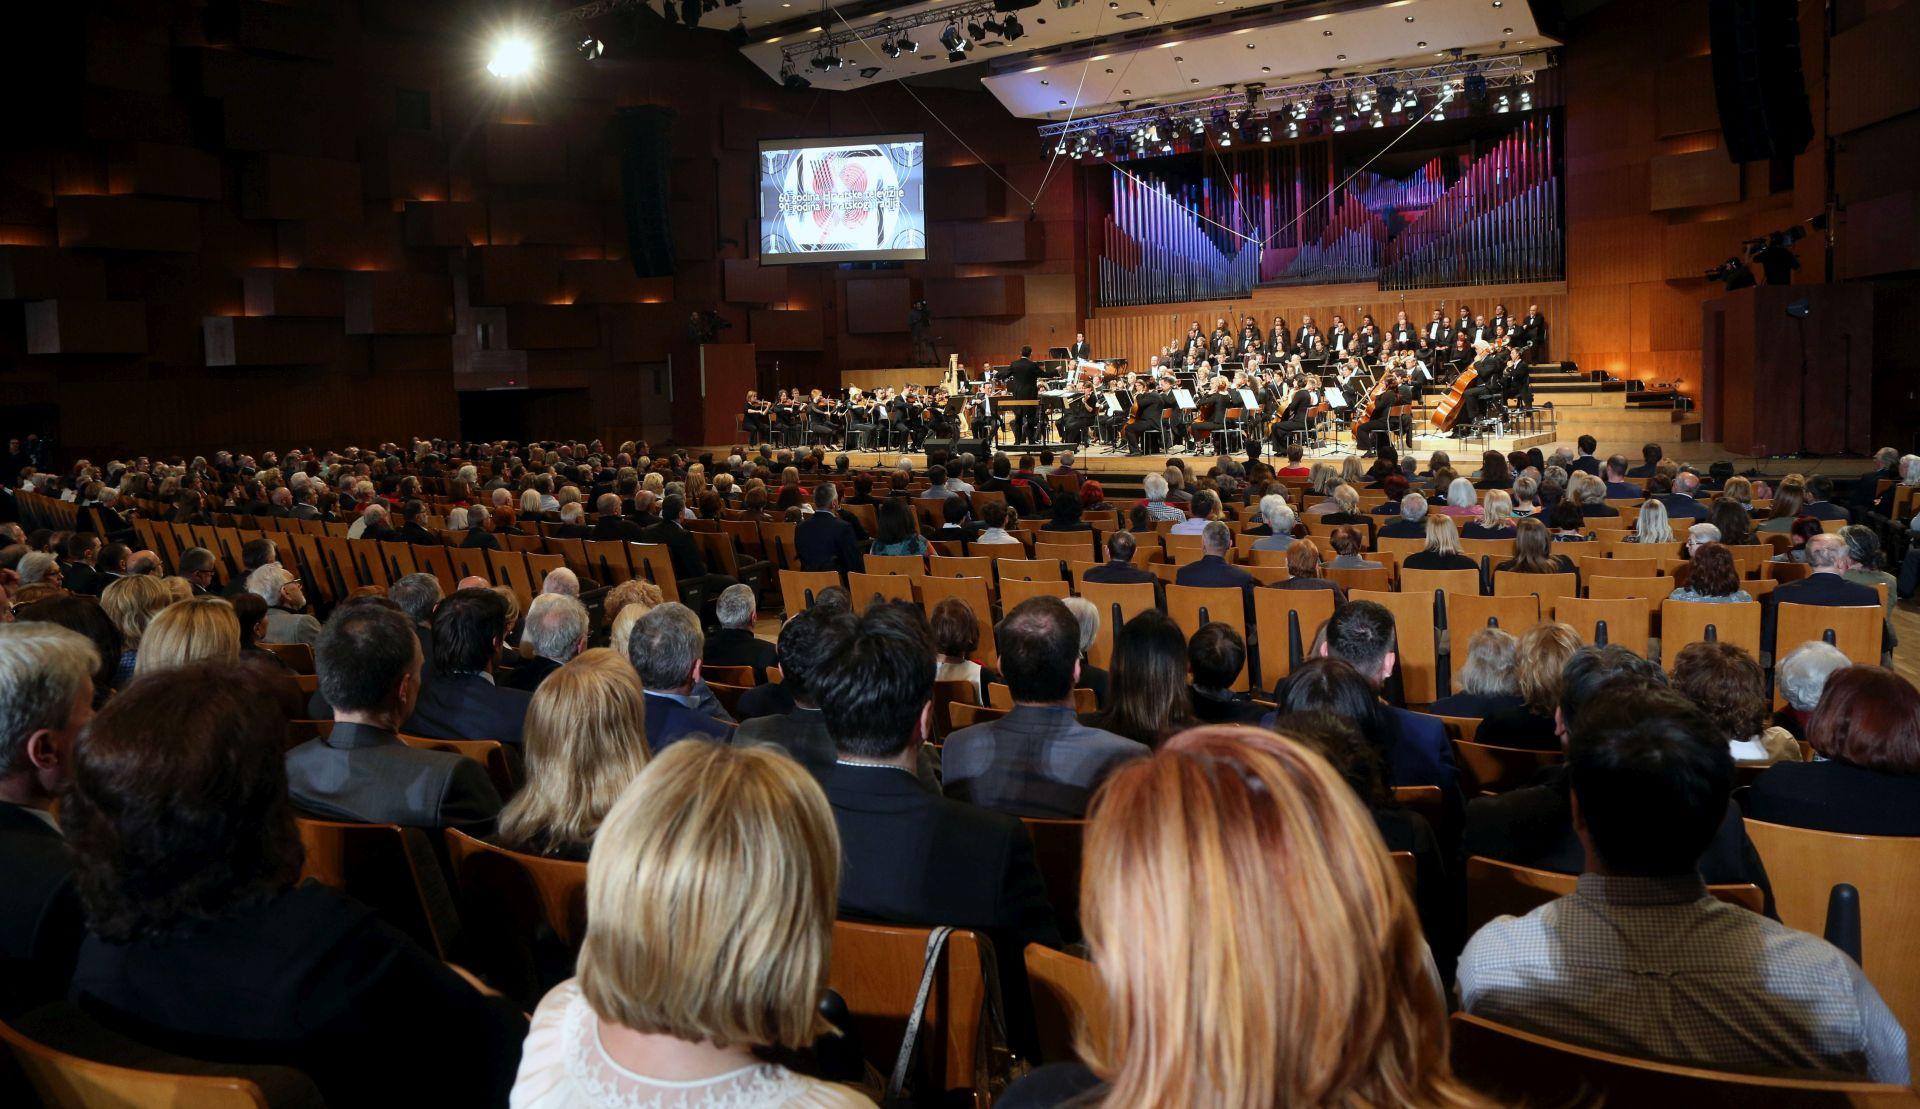 OBNOVA VODOTORNJA: Humanitarni koncert Orkestra OS RH i Banda US zračnih snaga